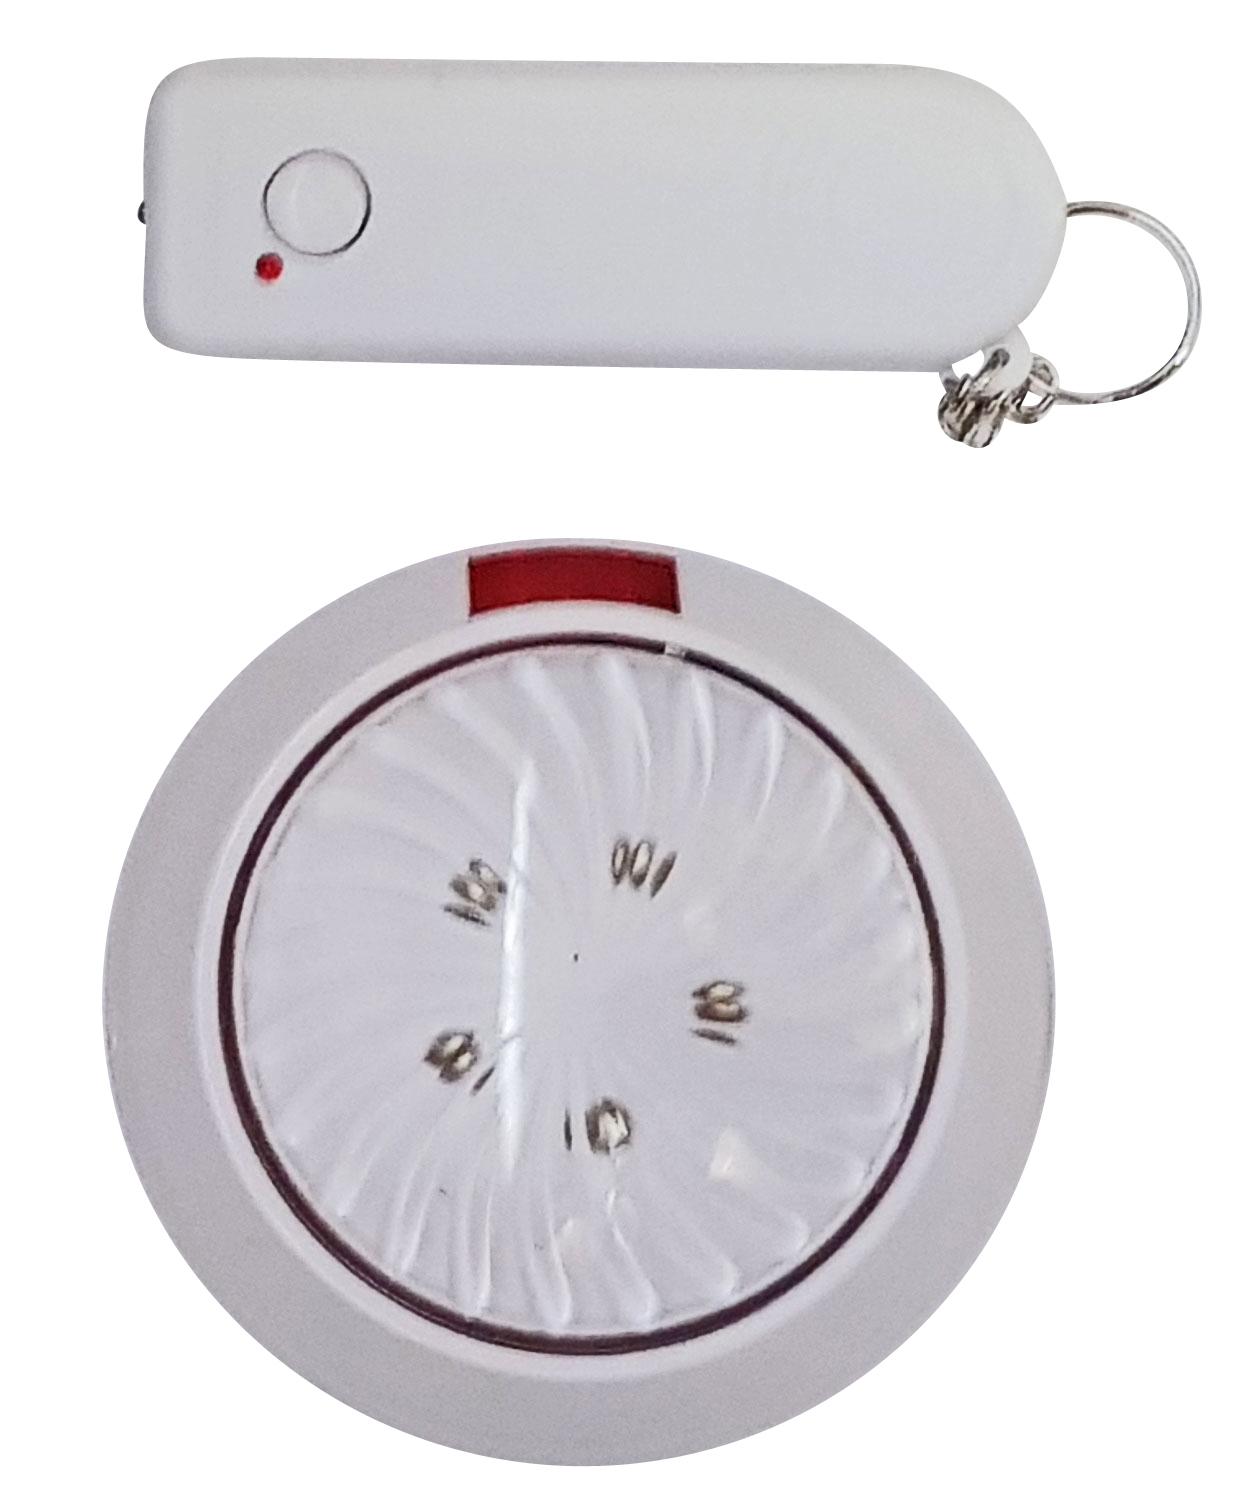 Led Lampe Mit Infrarot Fernbedienung Kabellos Batteriebetrieben Led